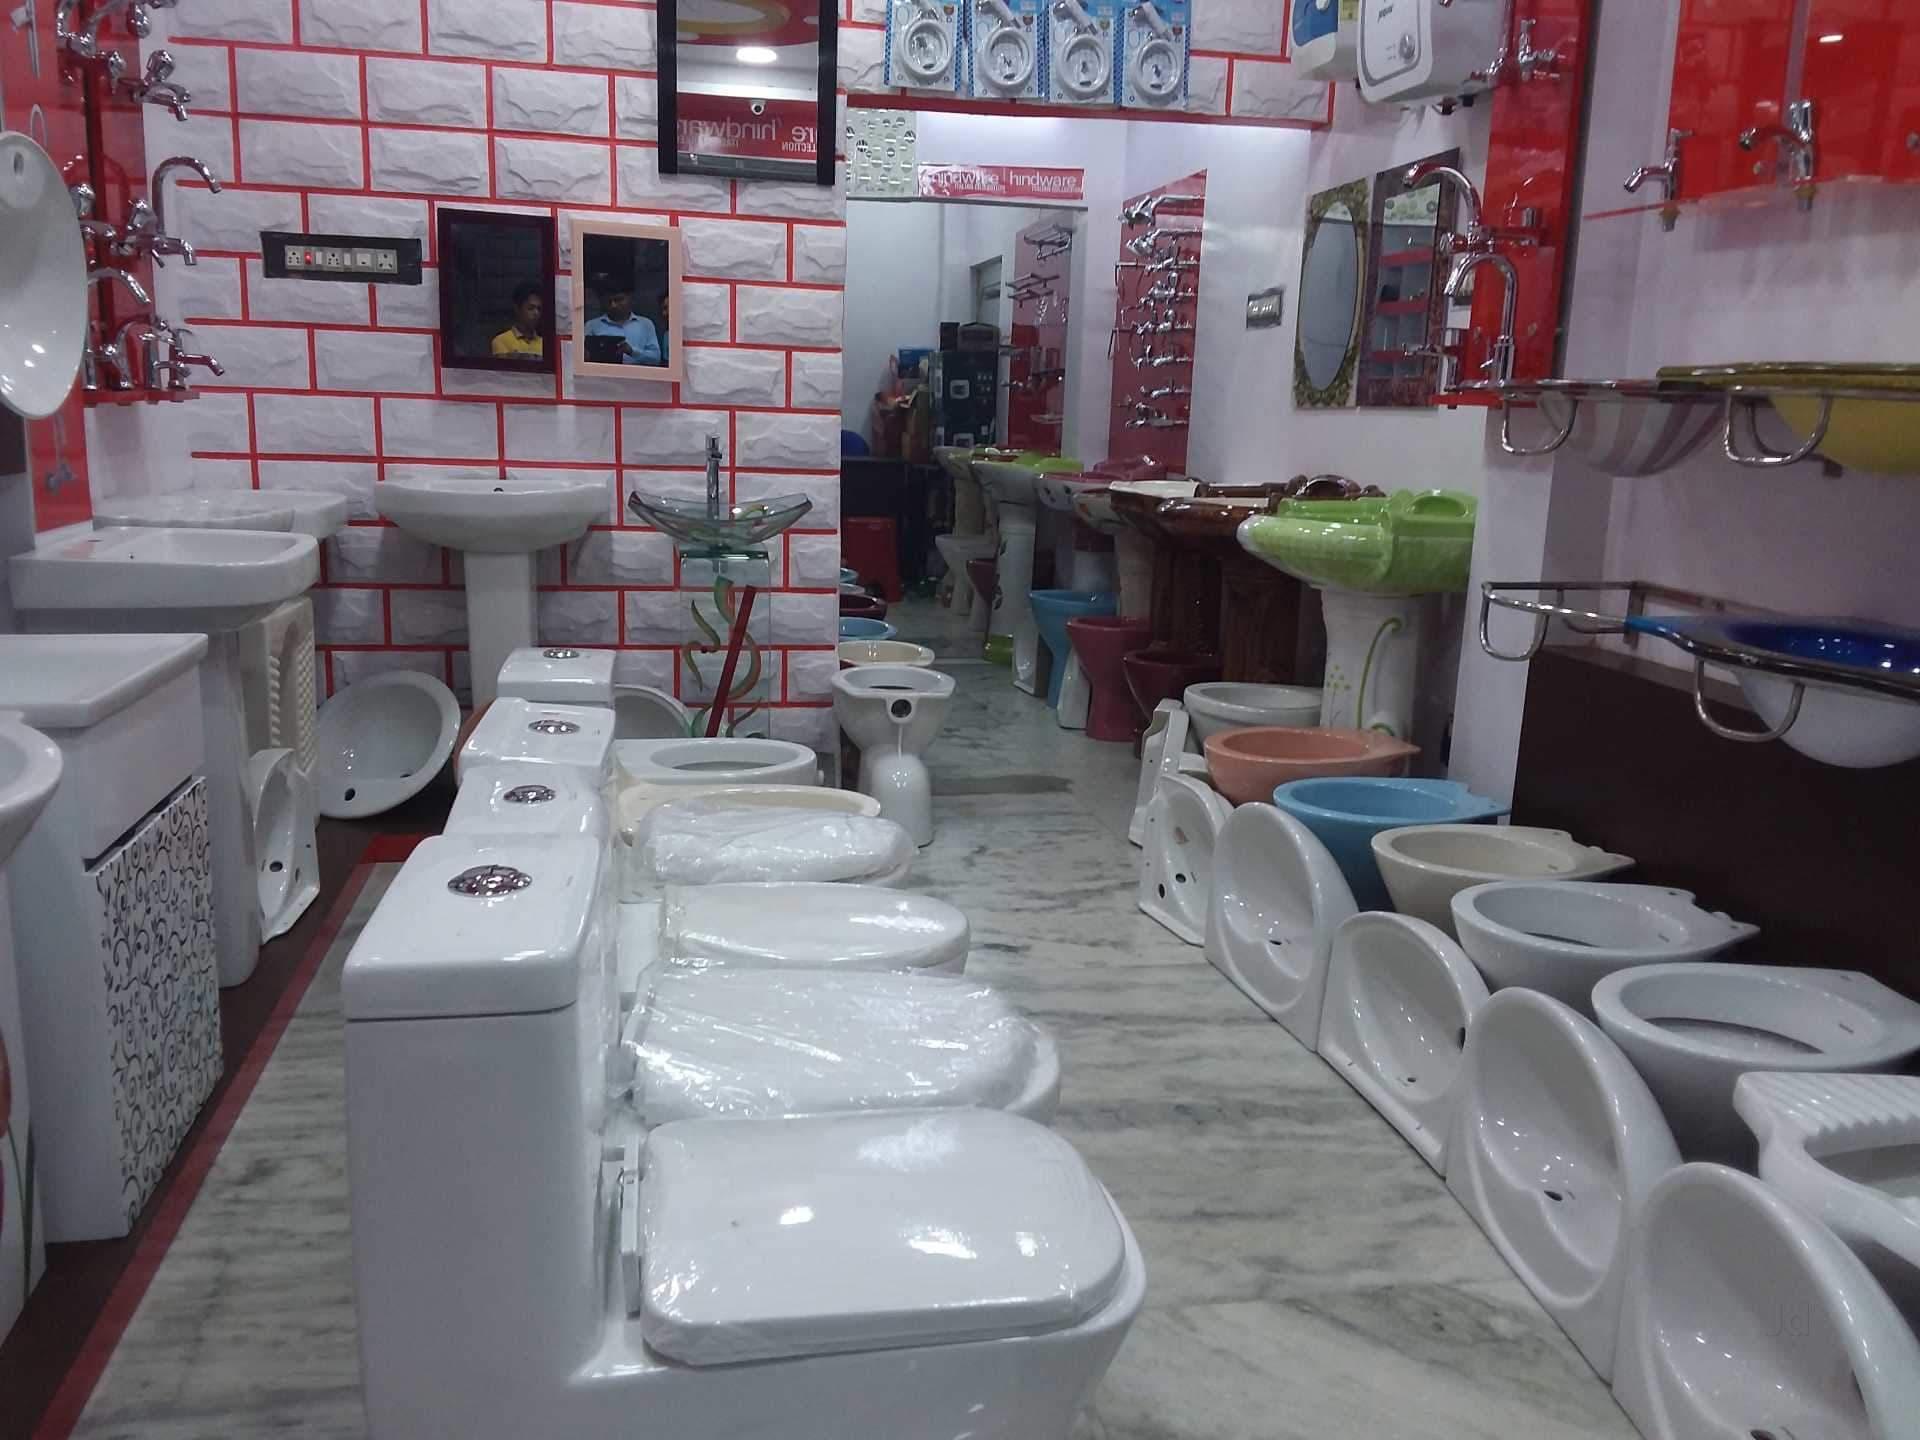 Toto Sanitaryware Dealers in Barasat, Kolkata - Buy Sanitary Ware ...